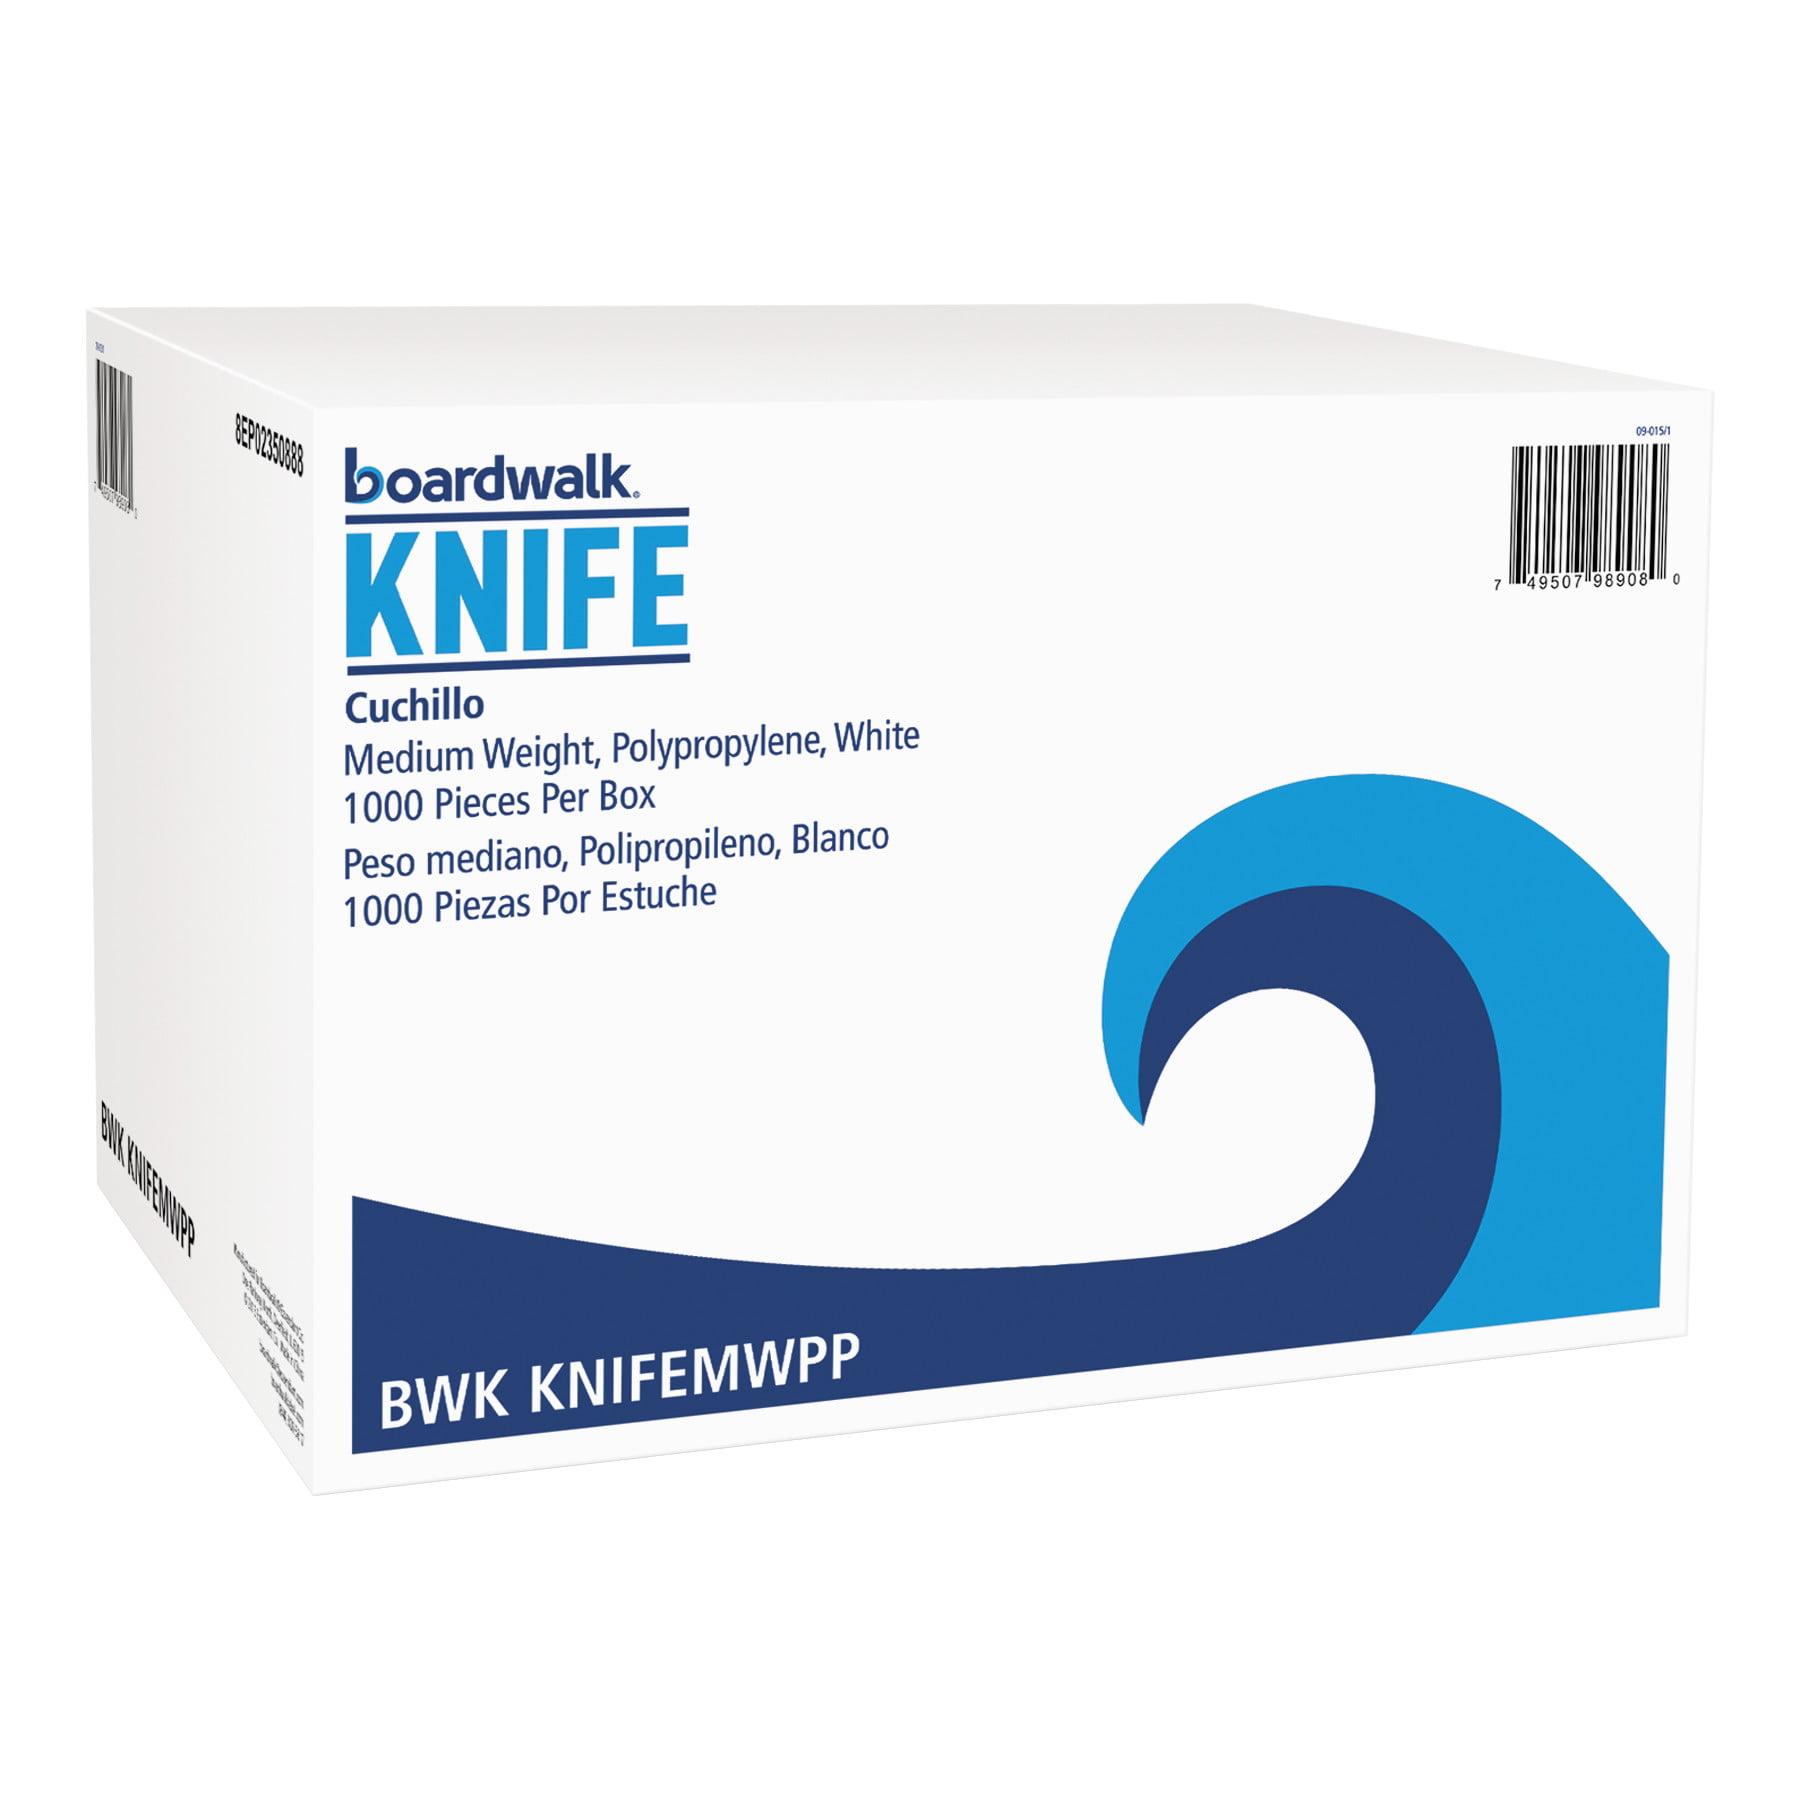 Boardwalk Medium Weight Polypropylene Knives, White, 1000 count -BWKKNIFEMWPP